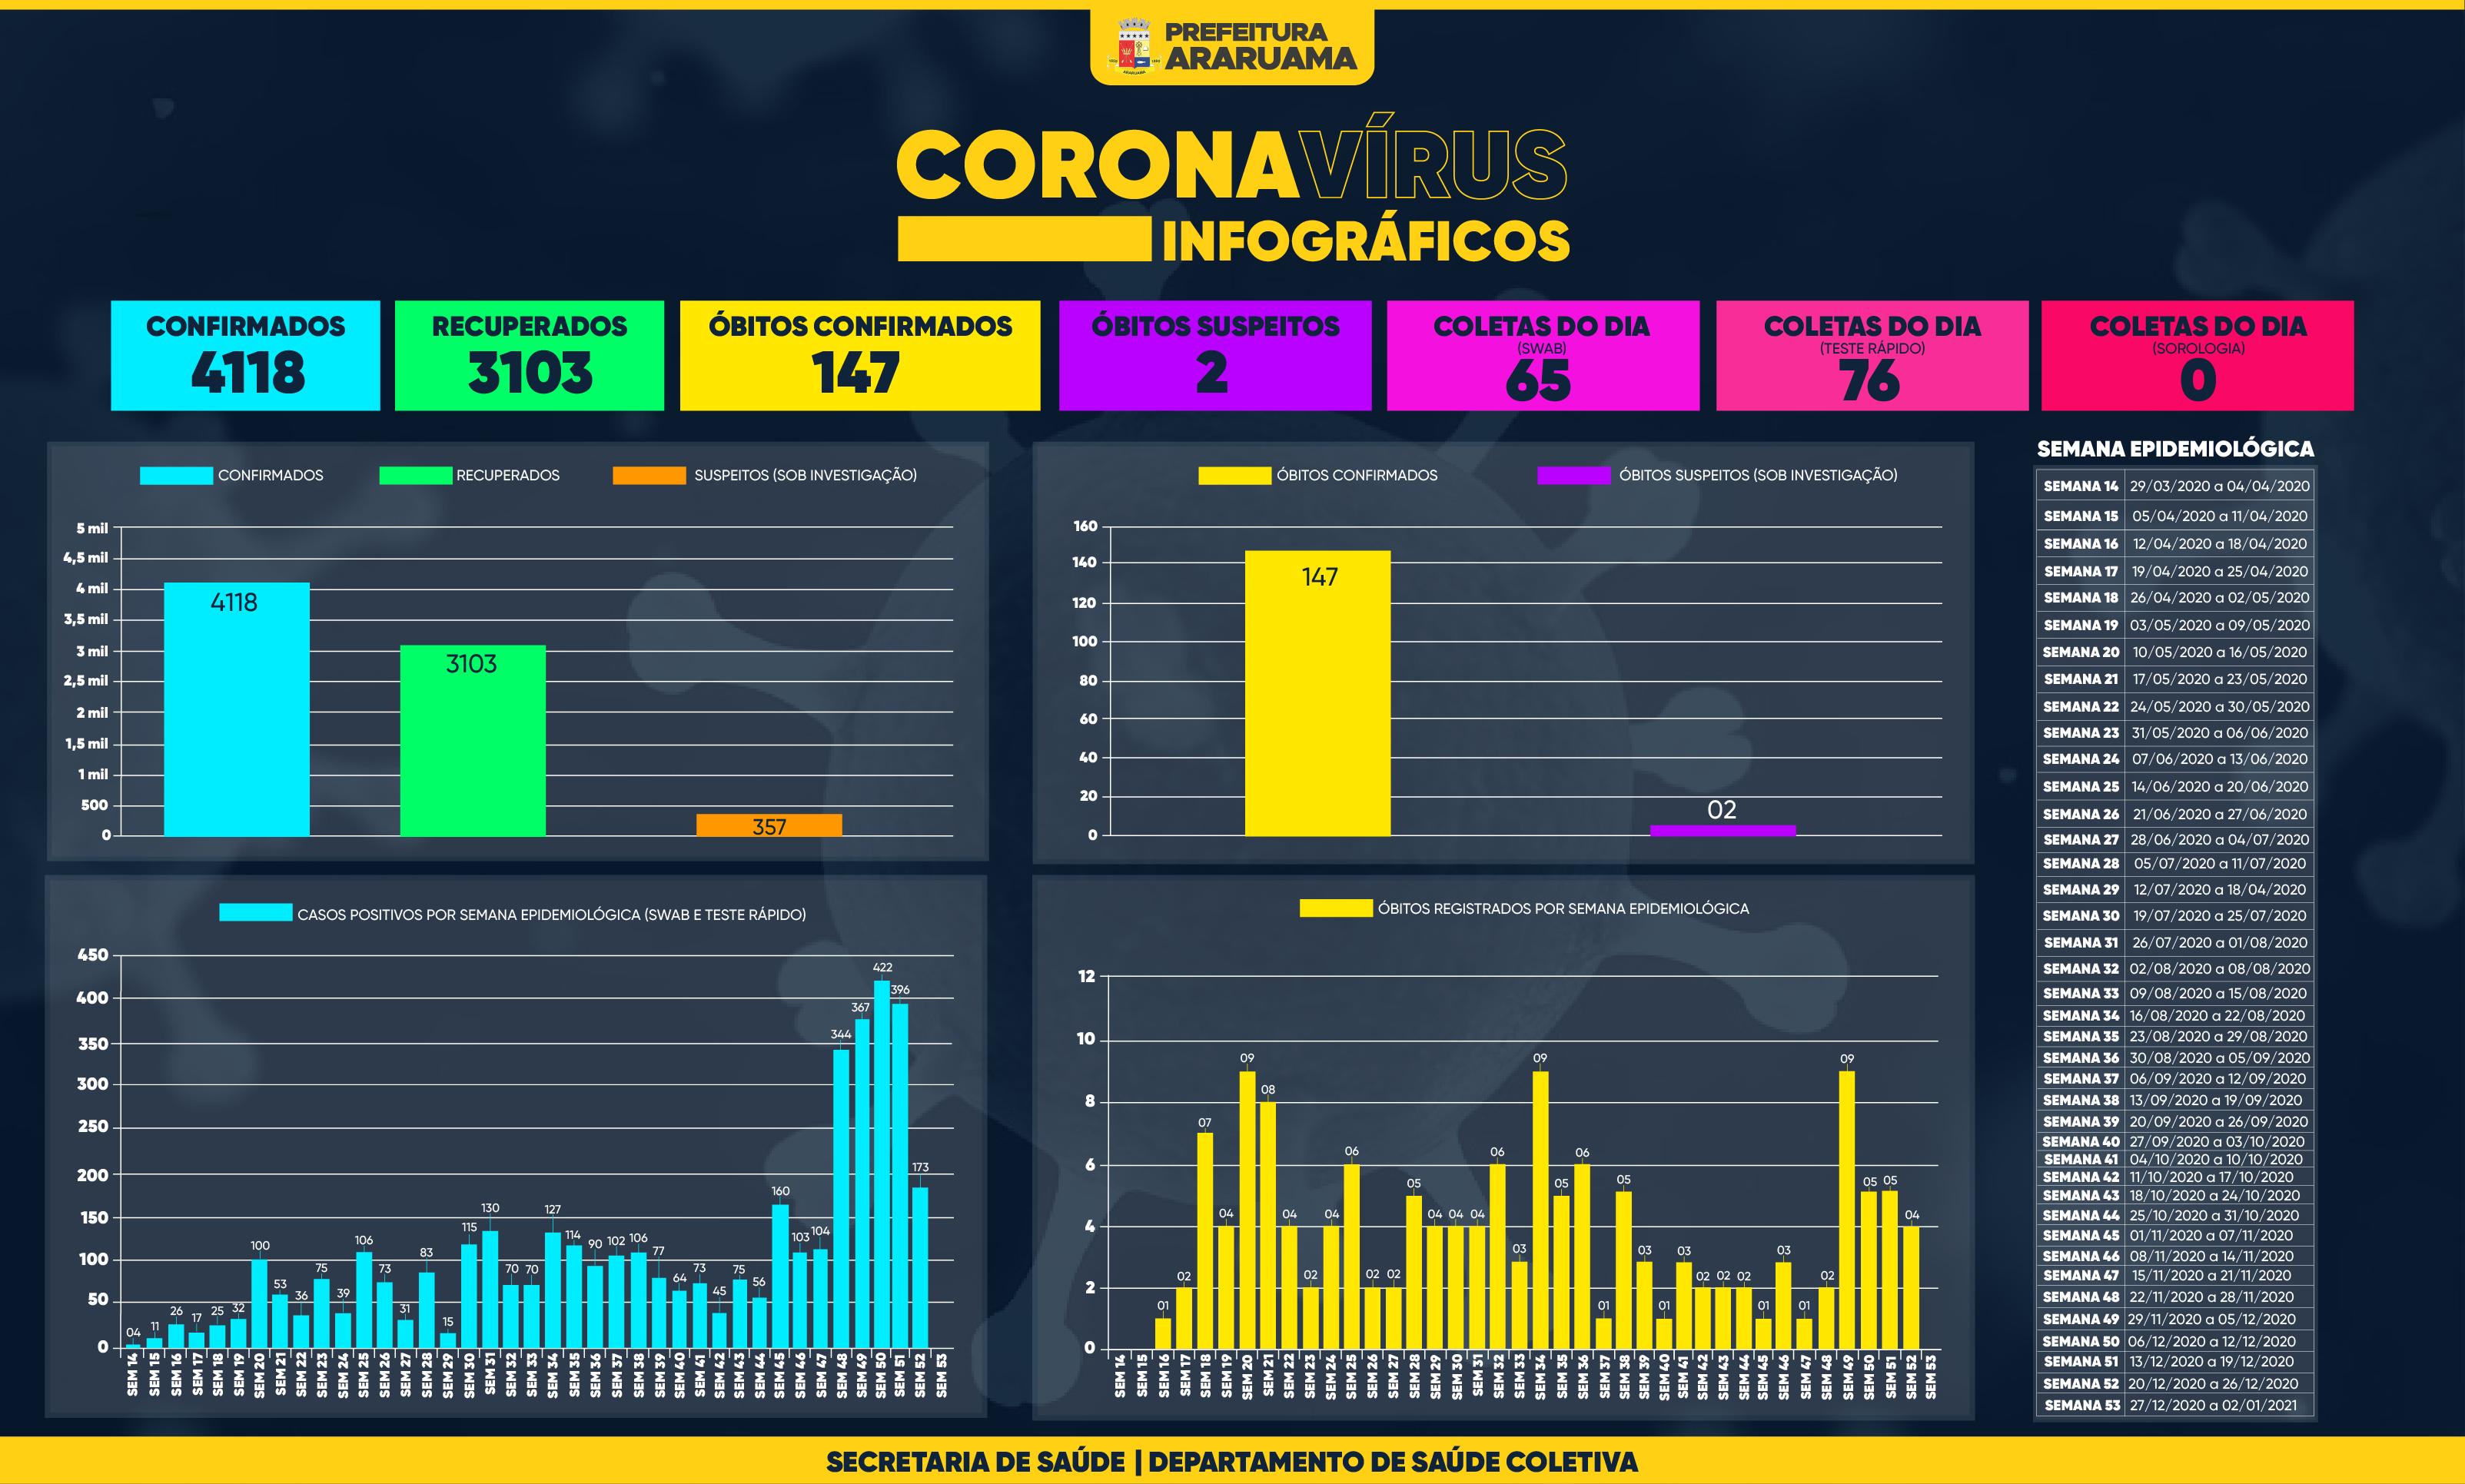 Painel de Monitoramento COVID-19 — Semana 53 — 28 de dezembro de 2020